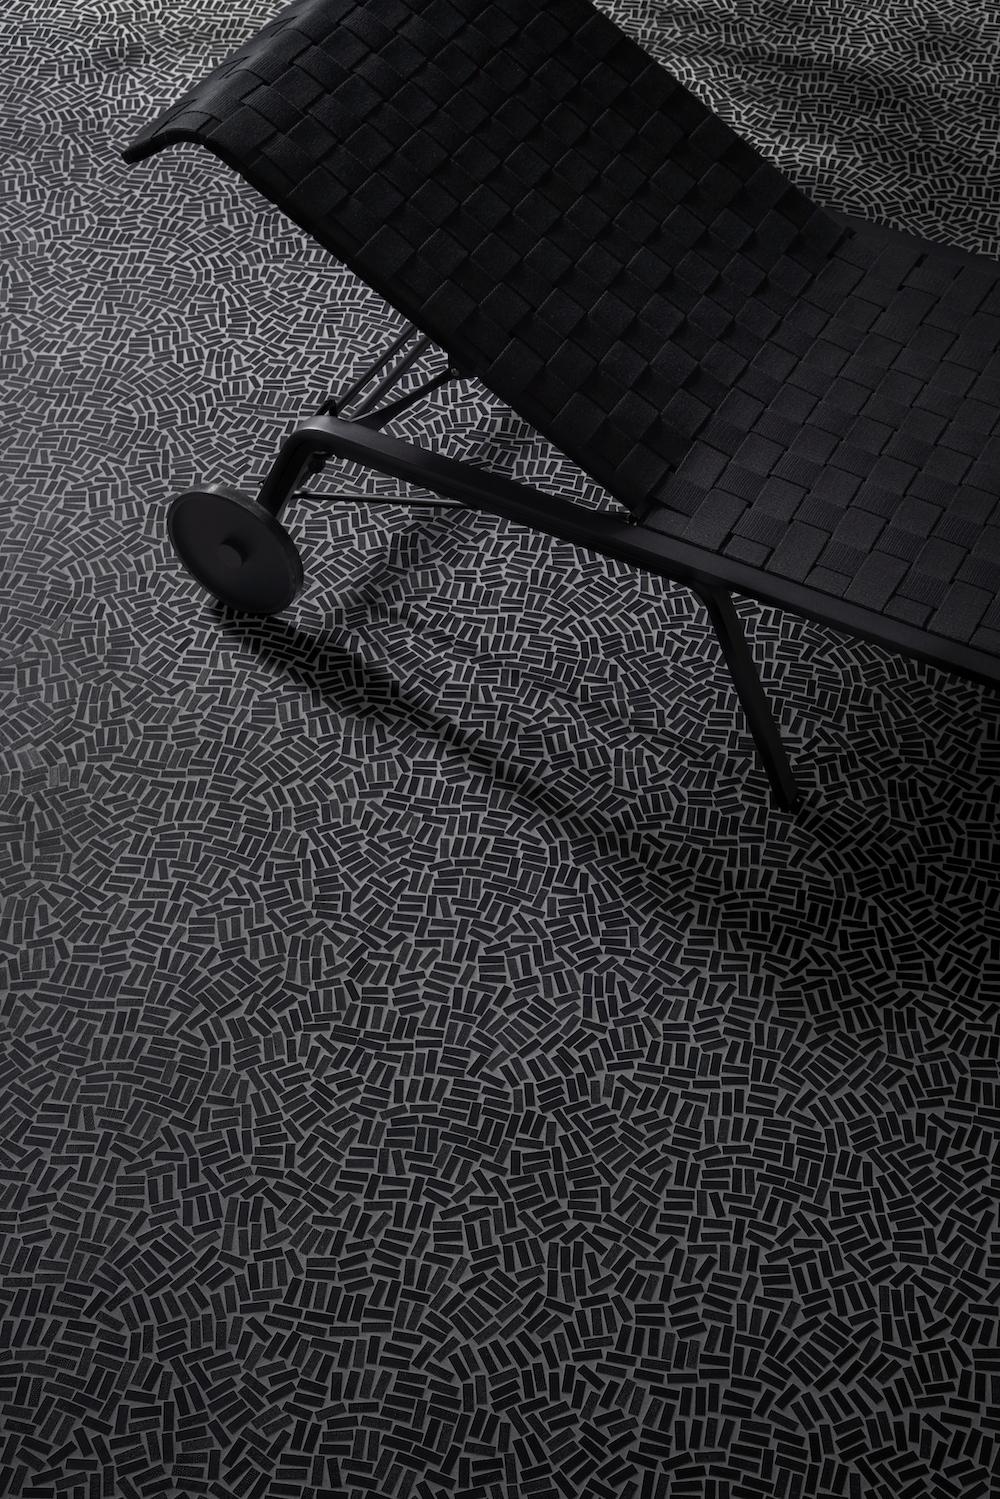 Image of dark flooring